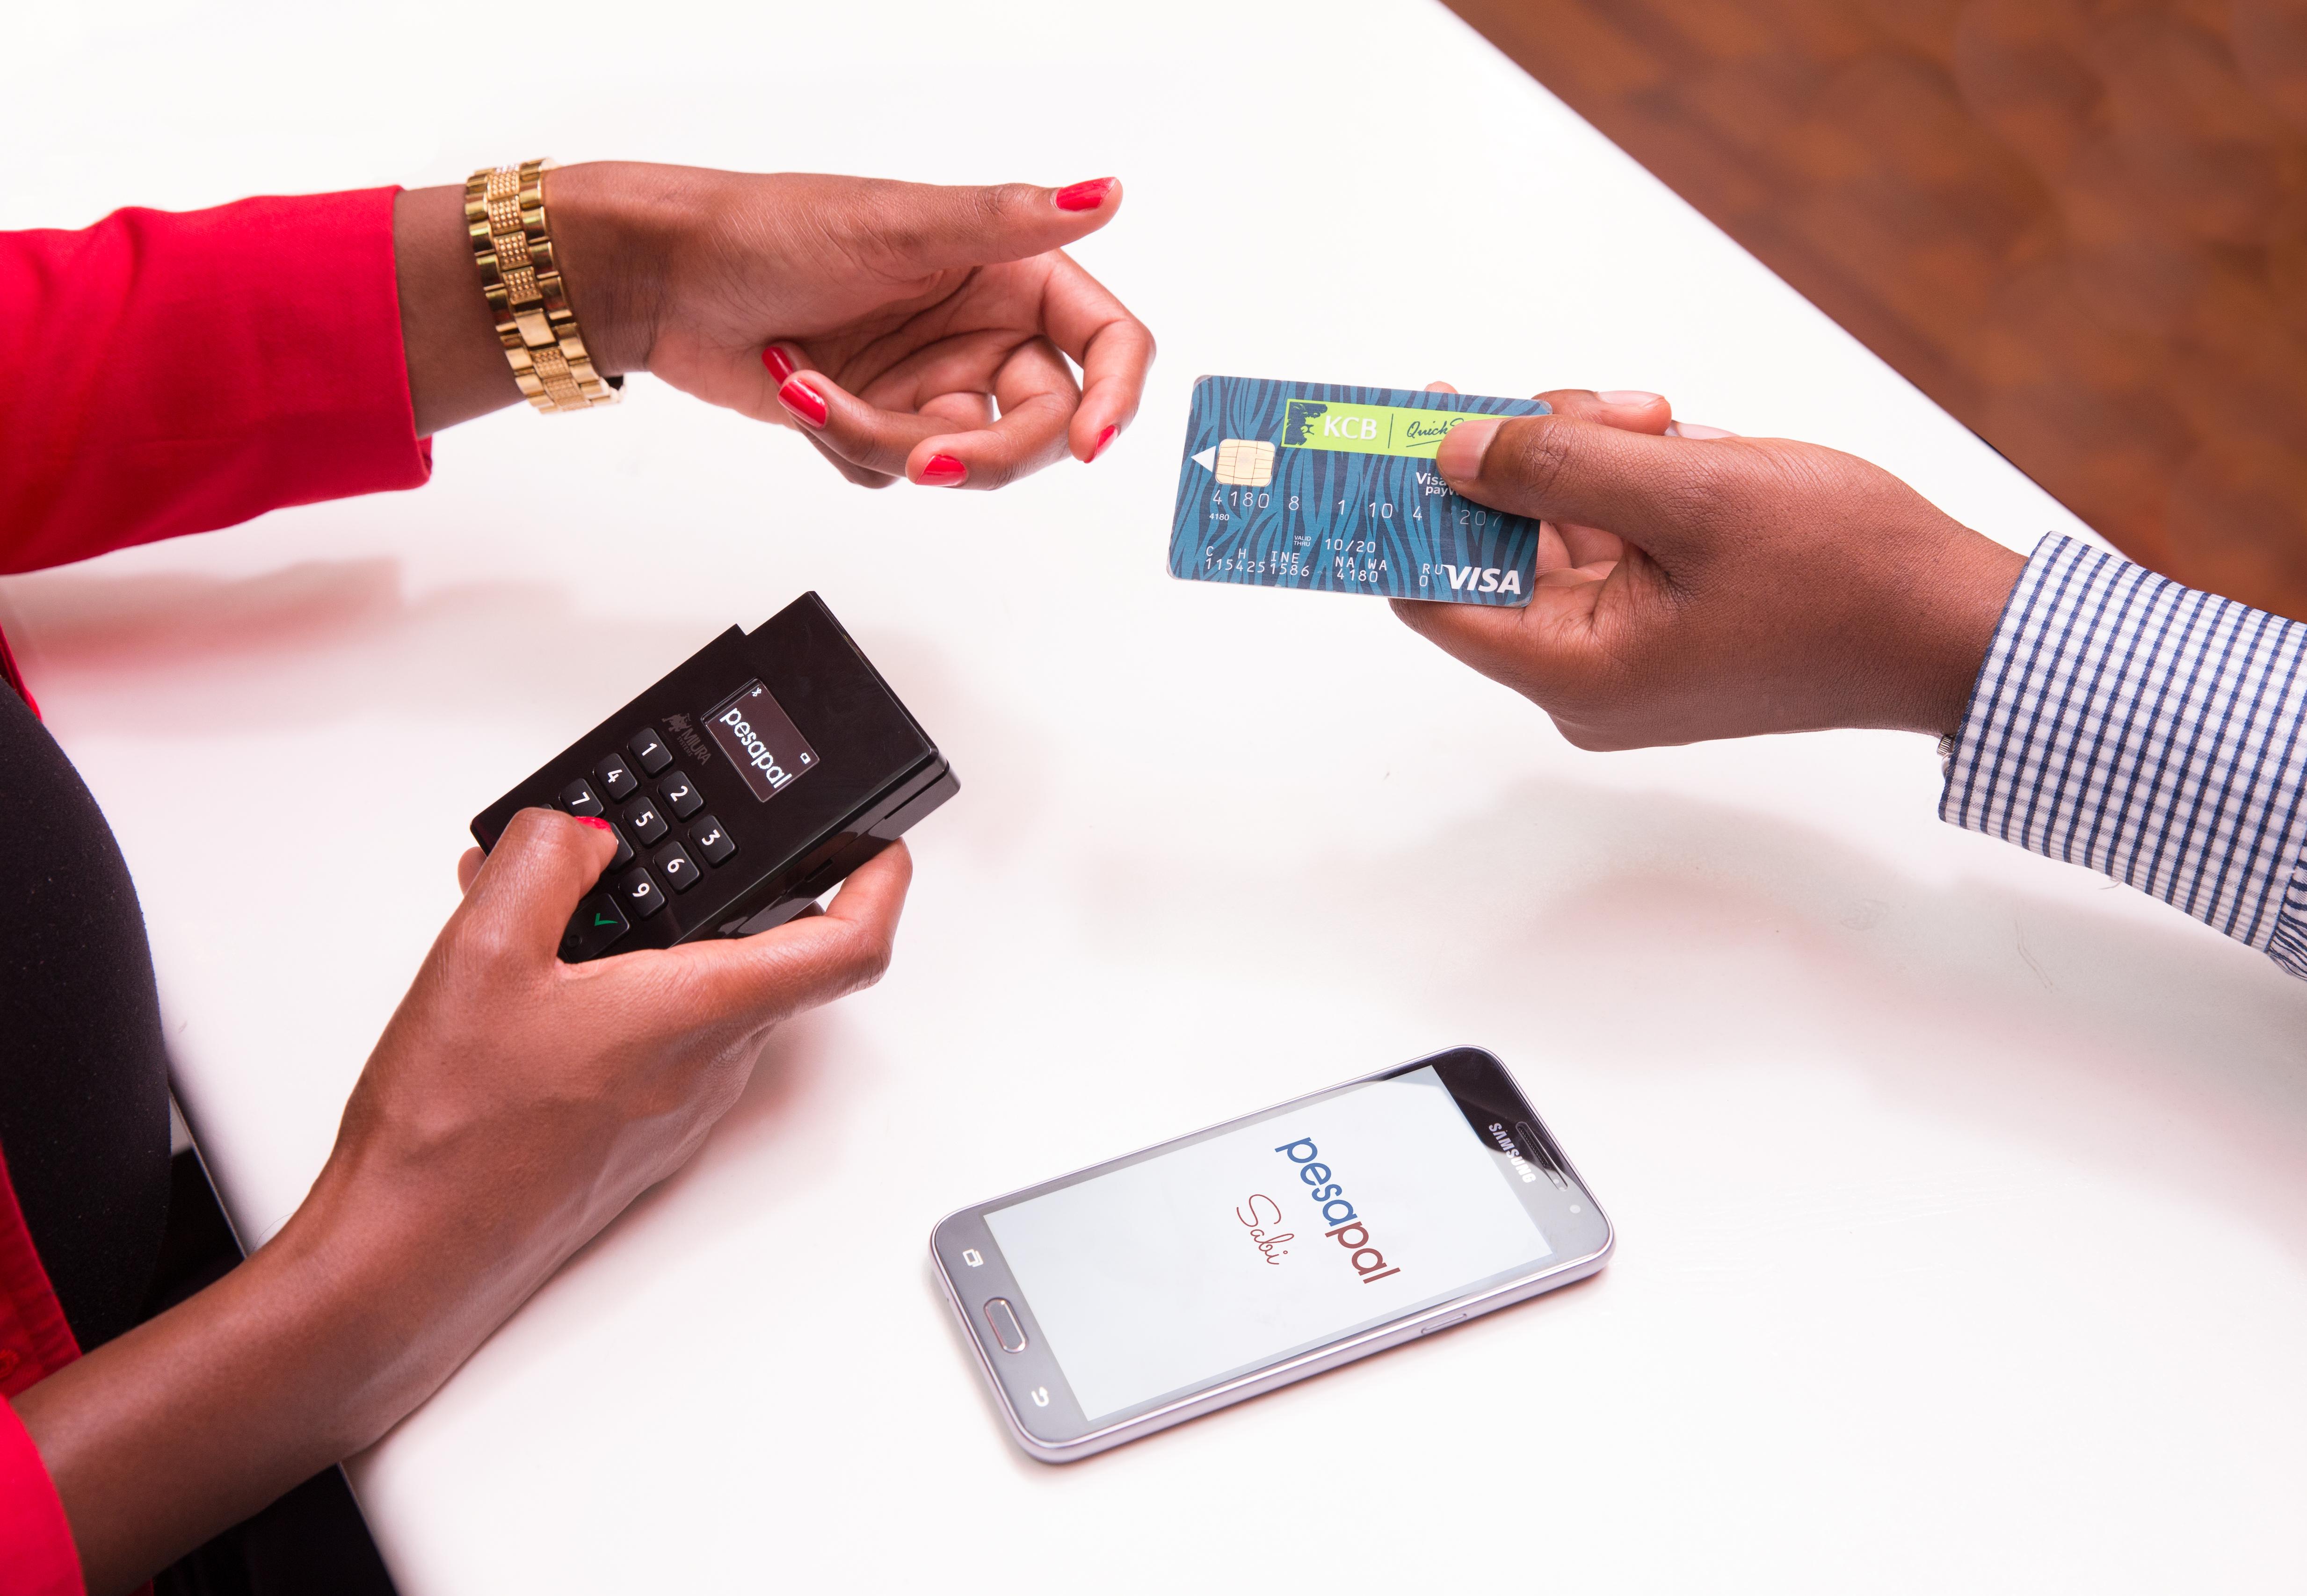 PesaPal's mobile point of sale, Sabi